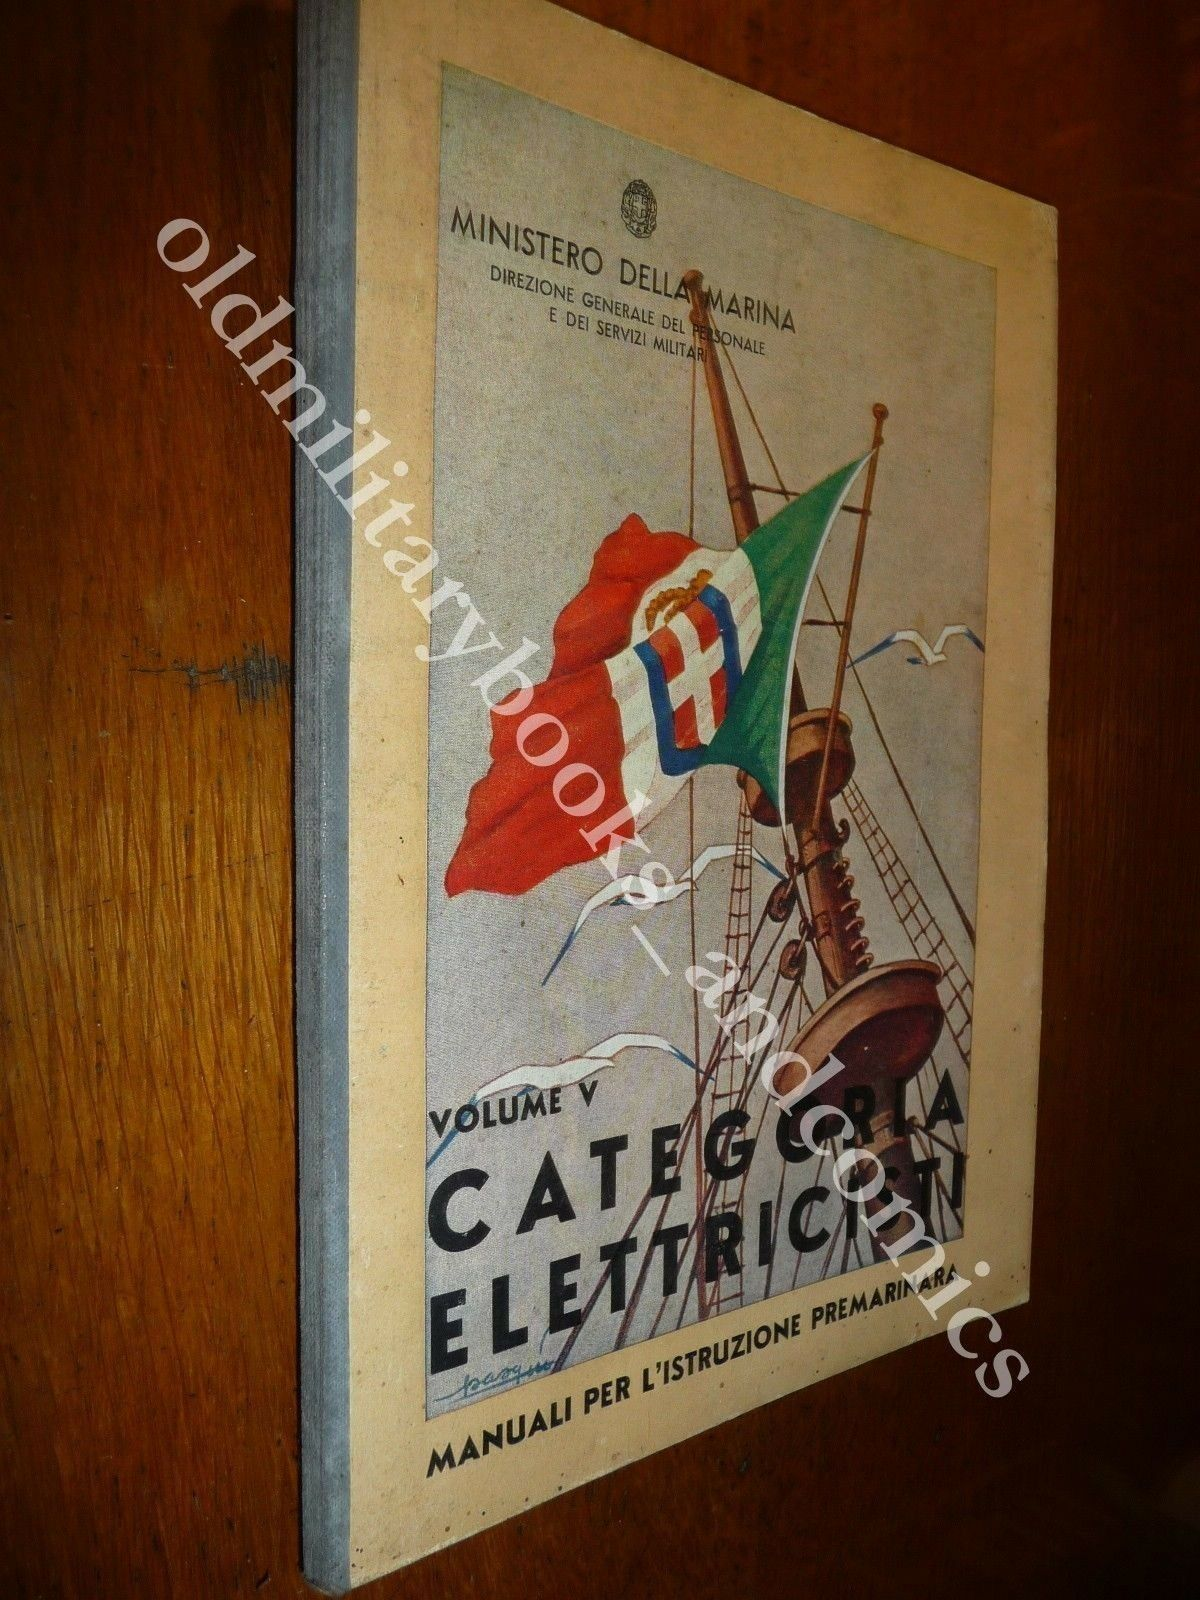 CATEGORIA ELETTRICISTI MANUALI PER L'ISTRUZIONE PREMARINARA 1936